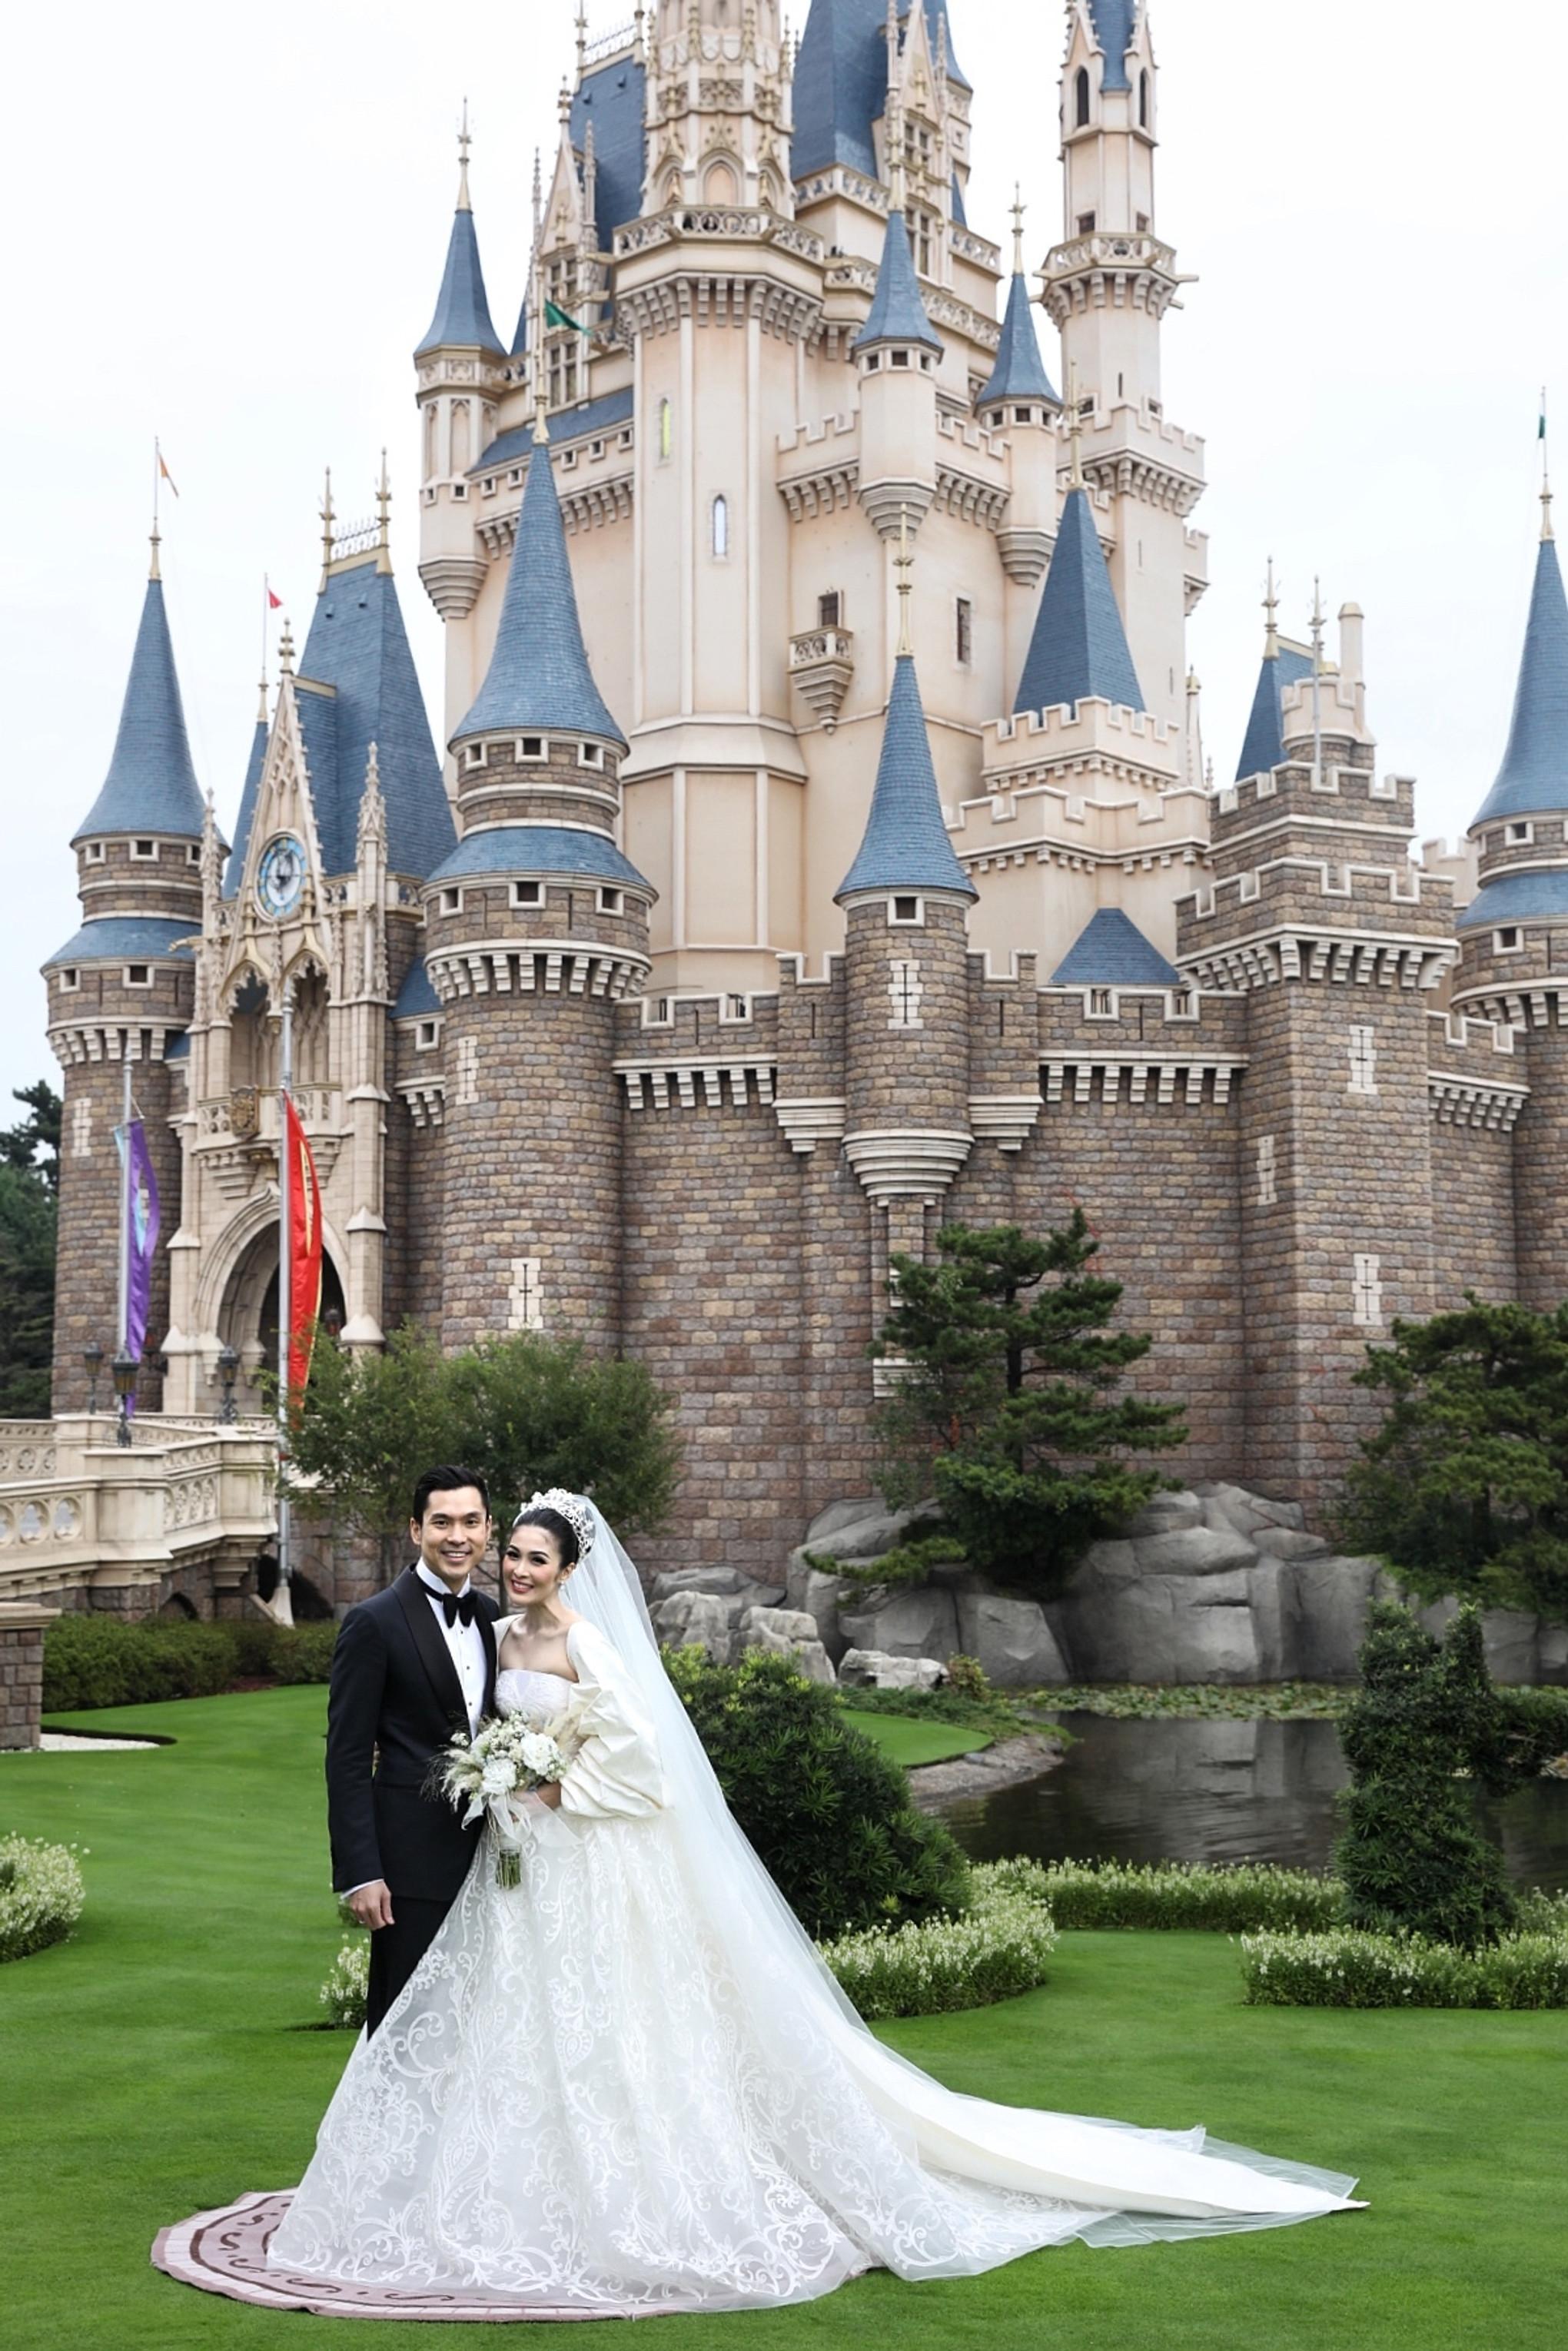 Sandra Dewi S Fairy Tale Wedding At Tokyo Disneyland Bridestory Blog